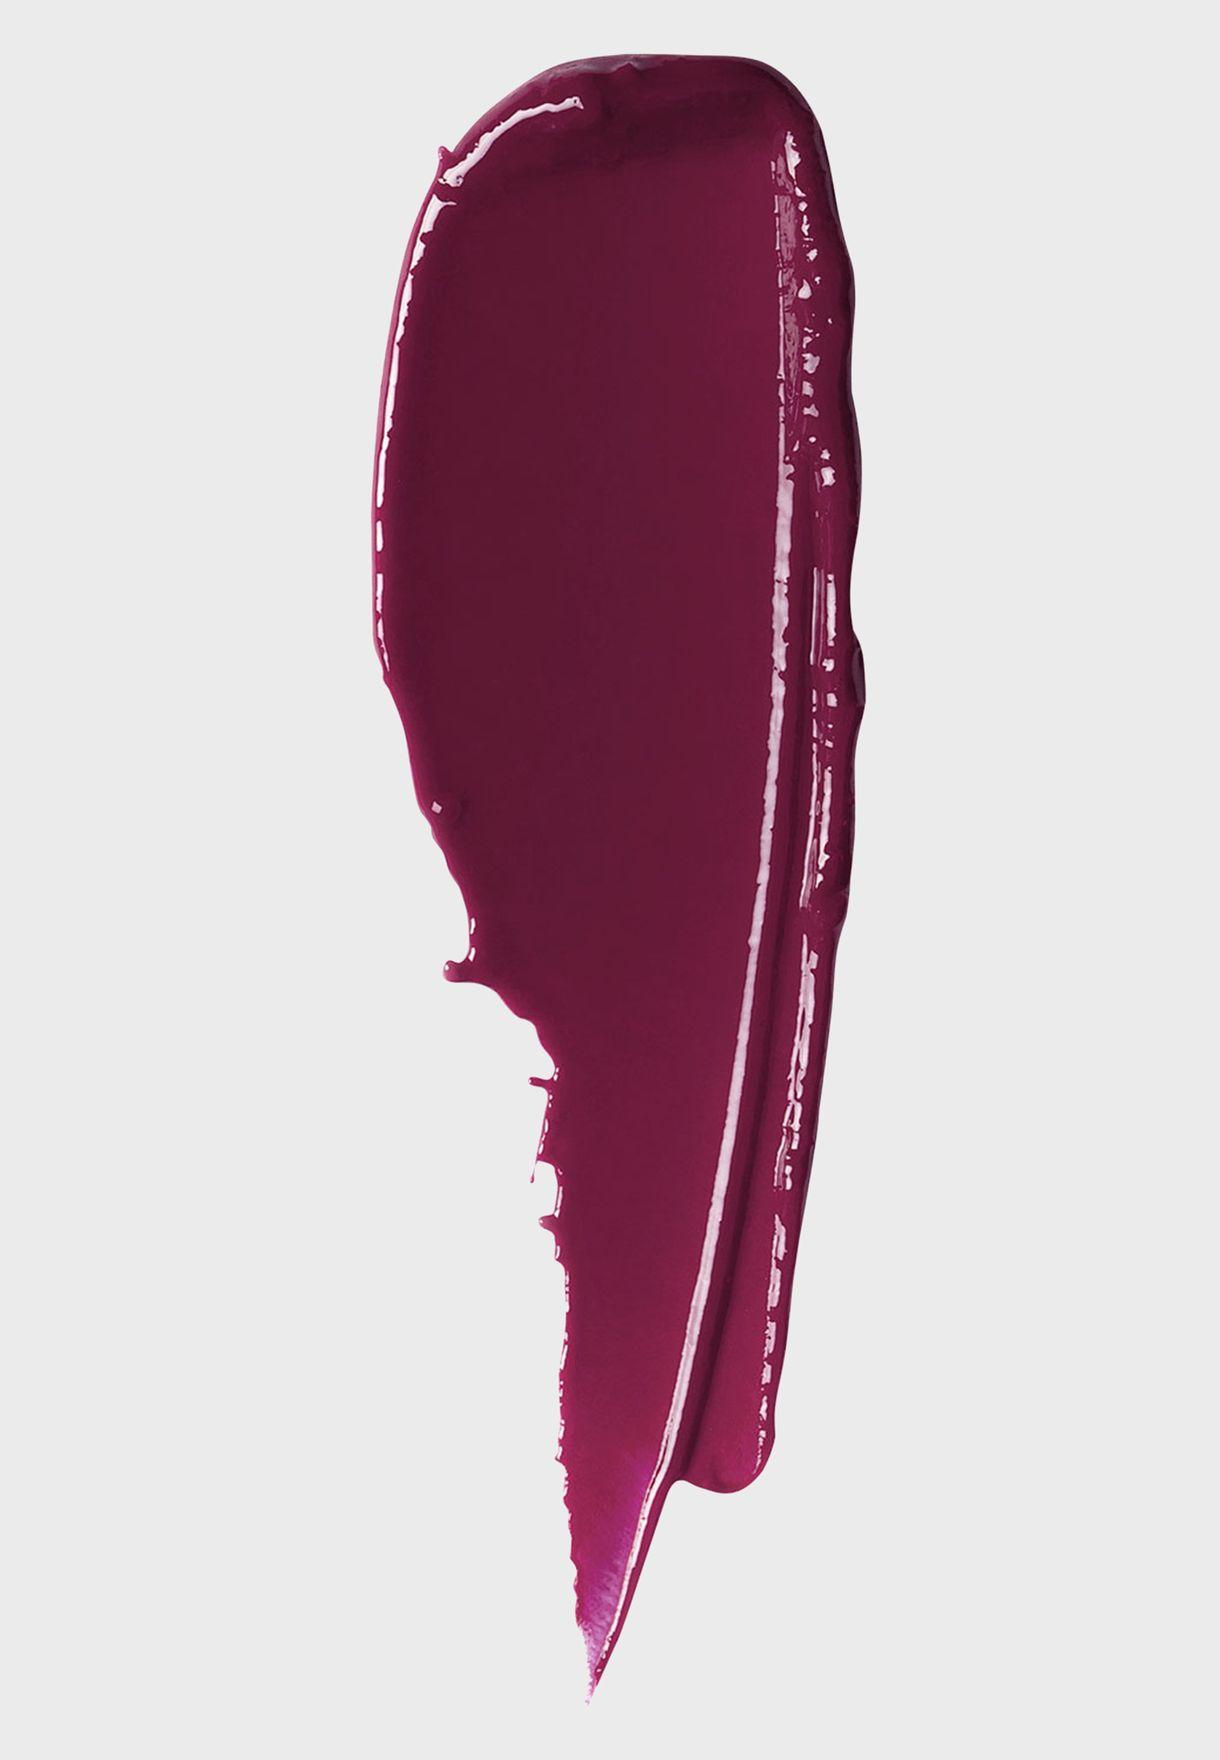 Kiss Catcher Liquid Lipstick - Dirty Kiss